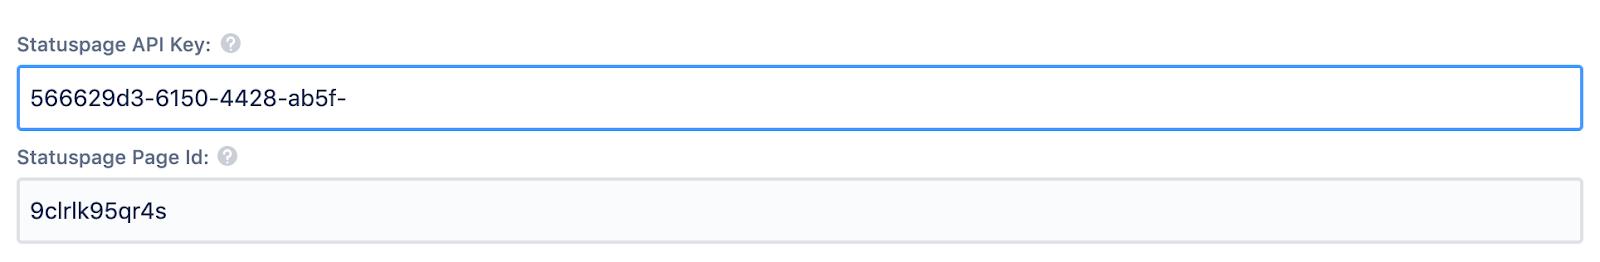 Statuspage API キーと ID